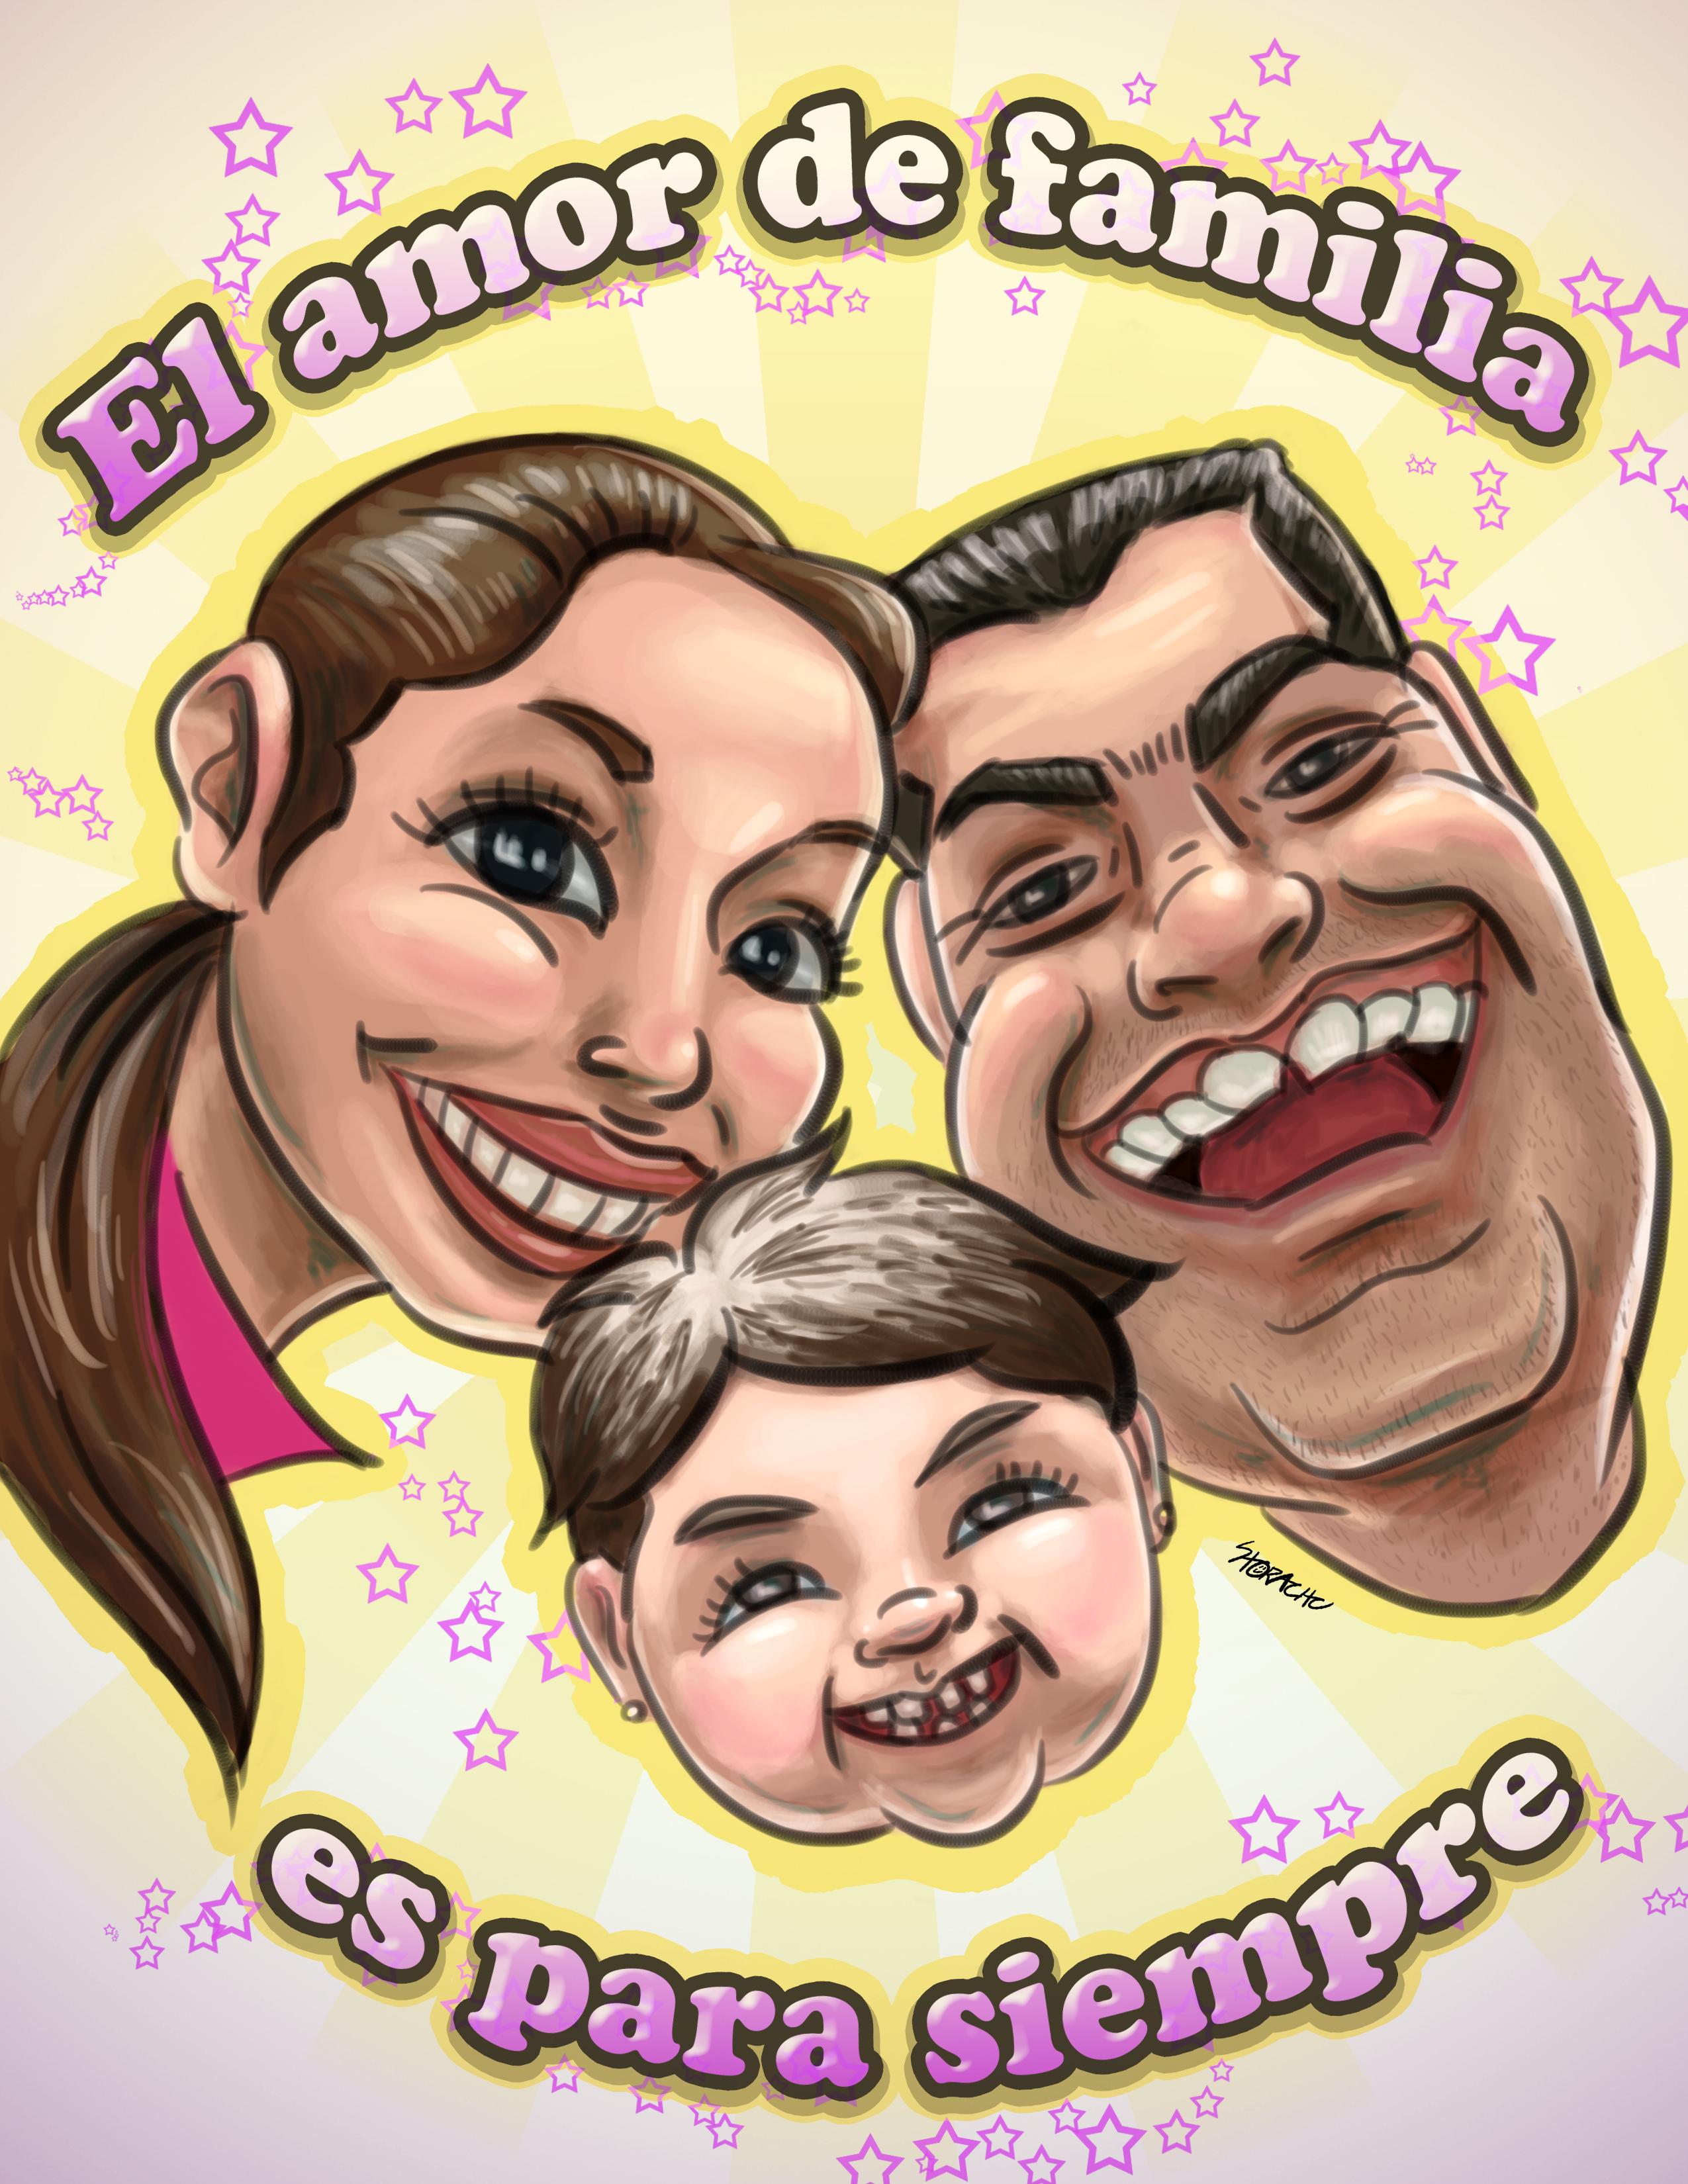 Family love is forever